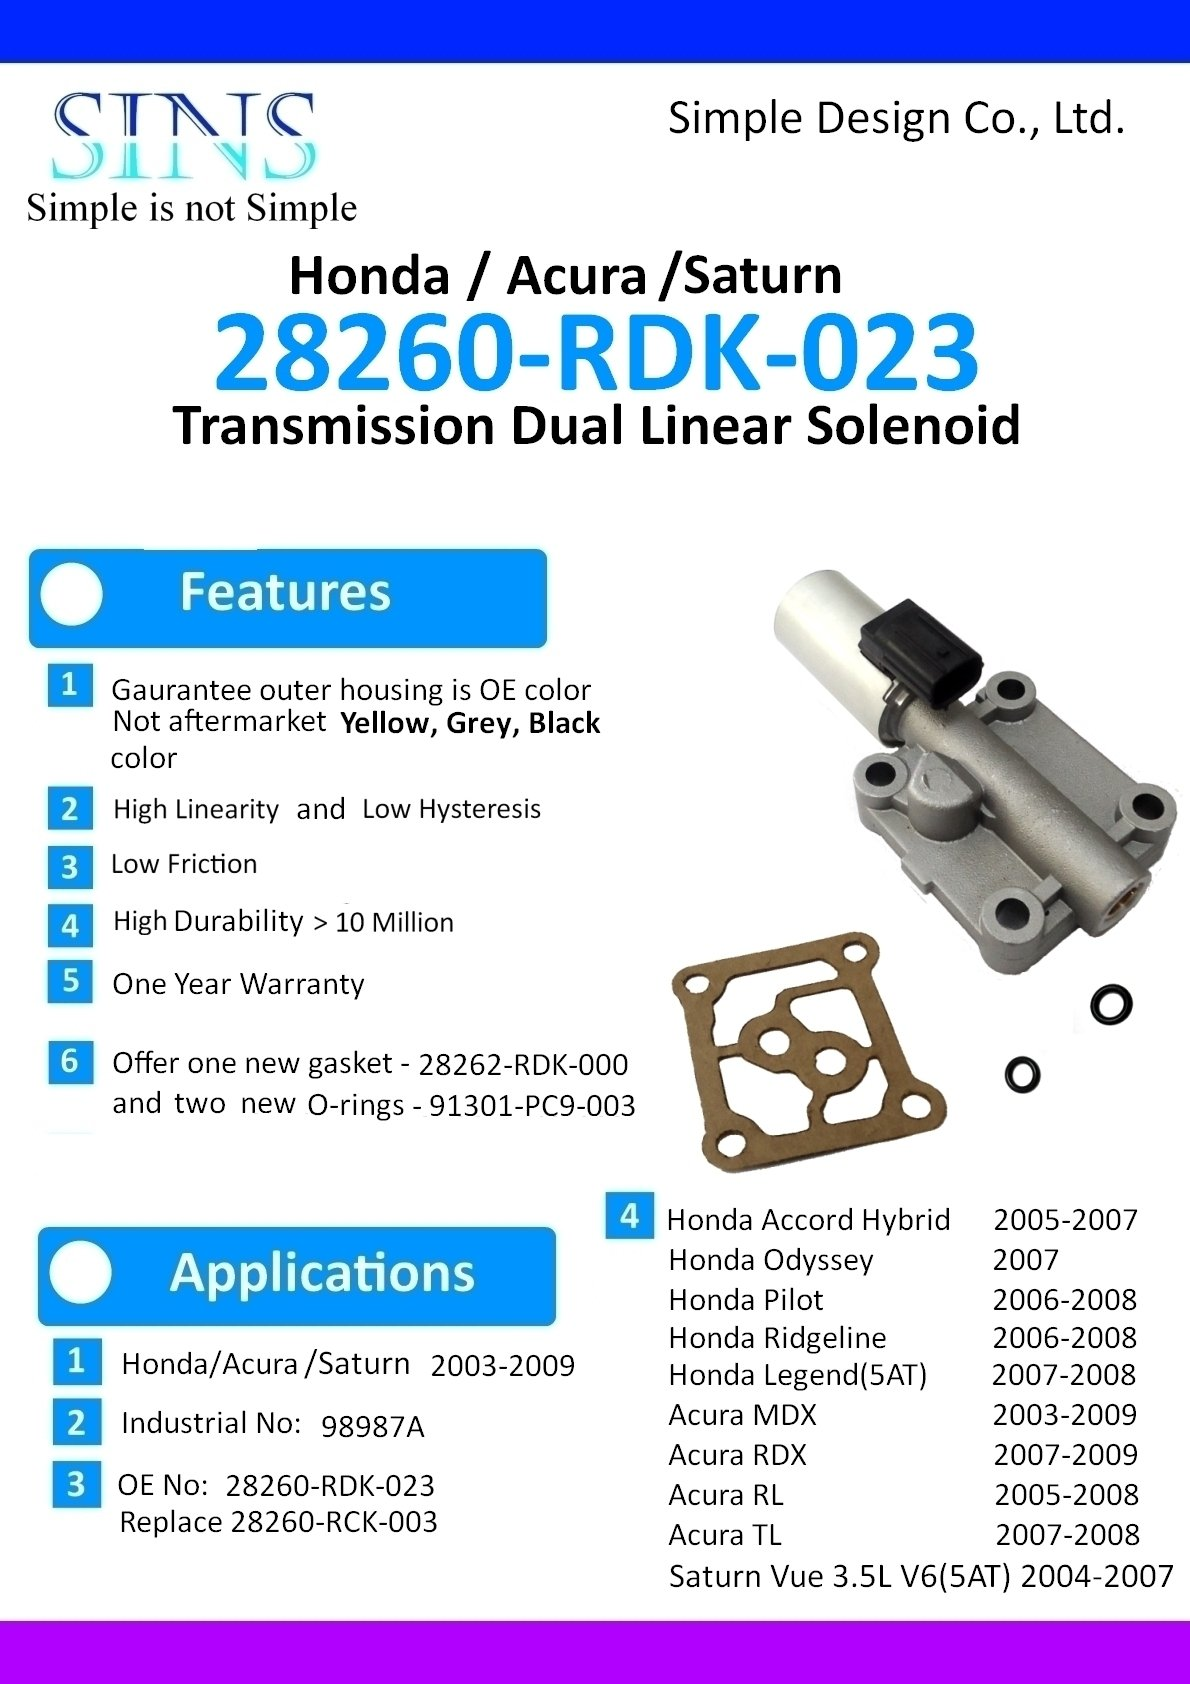 SINS - Accord Hybrid Odyssey Pilot Ridgeline Legend MDX RDX RL TL Saturn Vue 3.5L V6 Transmission AT Clutch Pressure Control Solenoid Valve C 28260-RDK-023 28260-RCK-003 by SINS (Image #6)